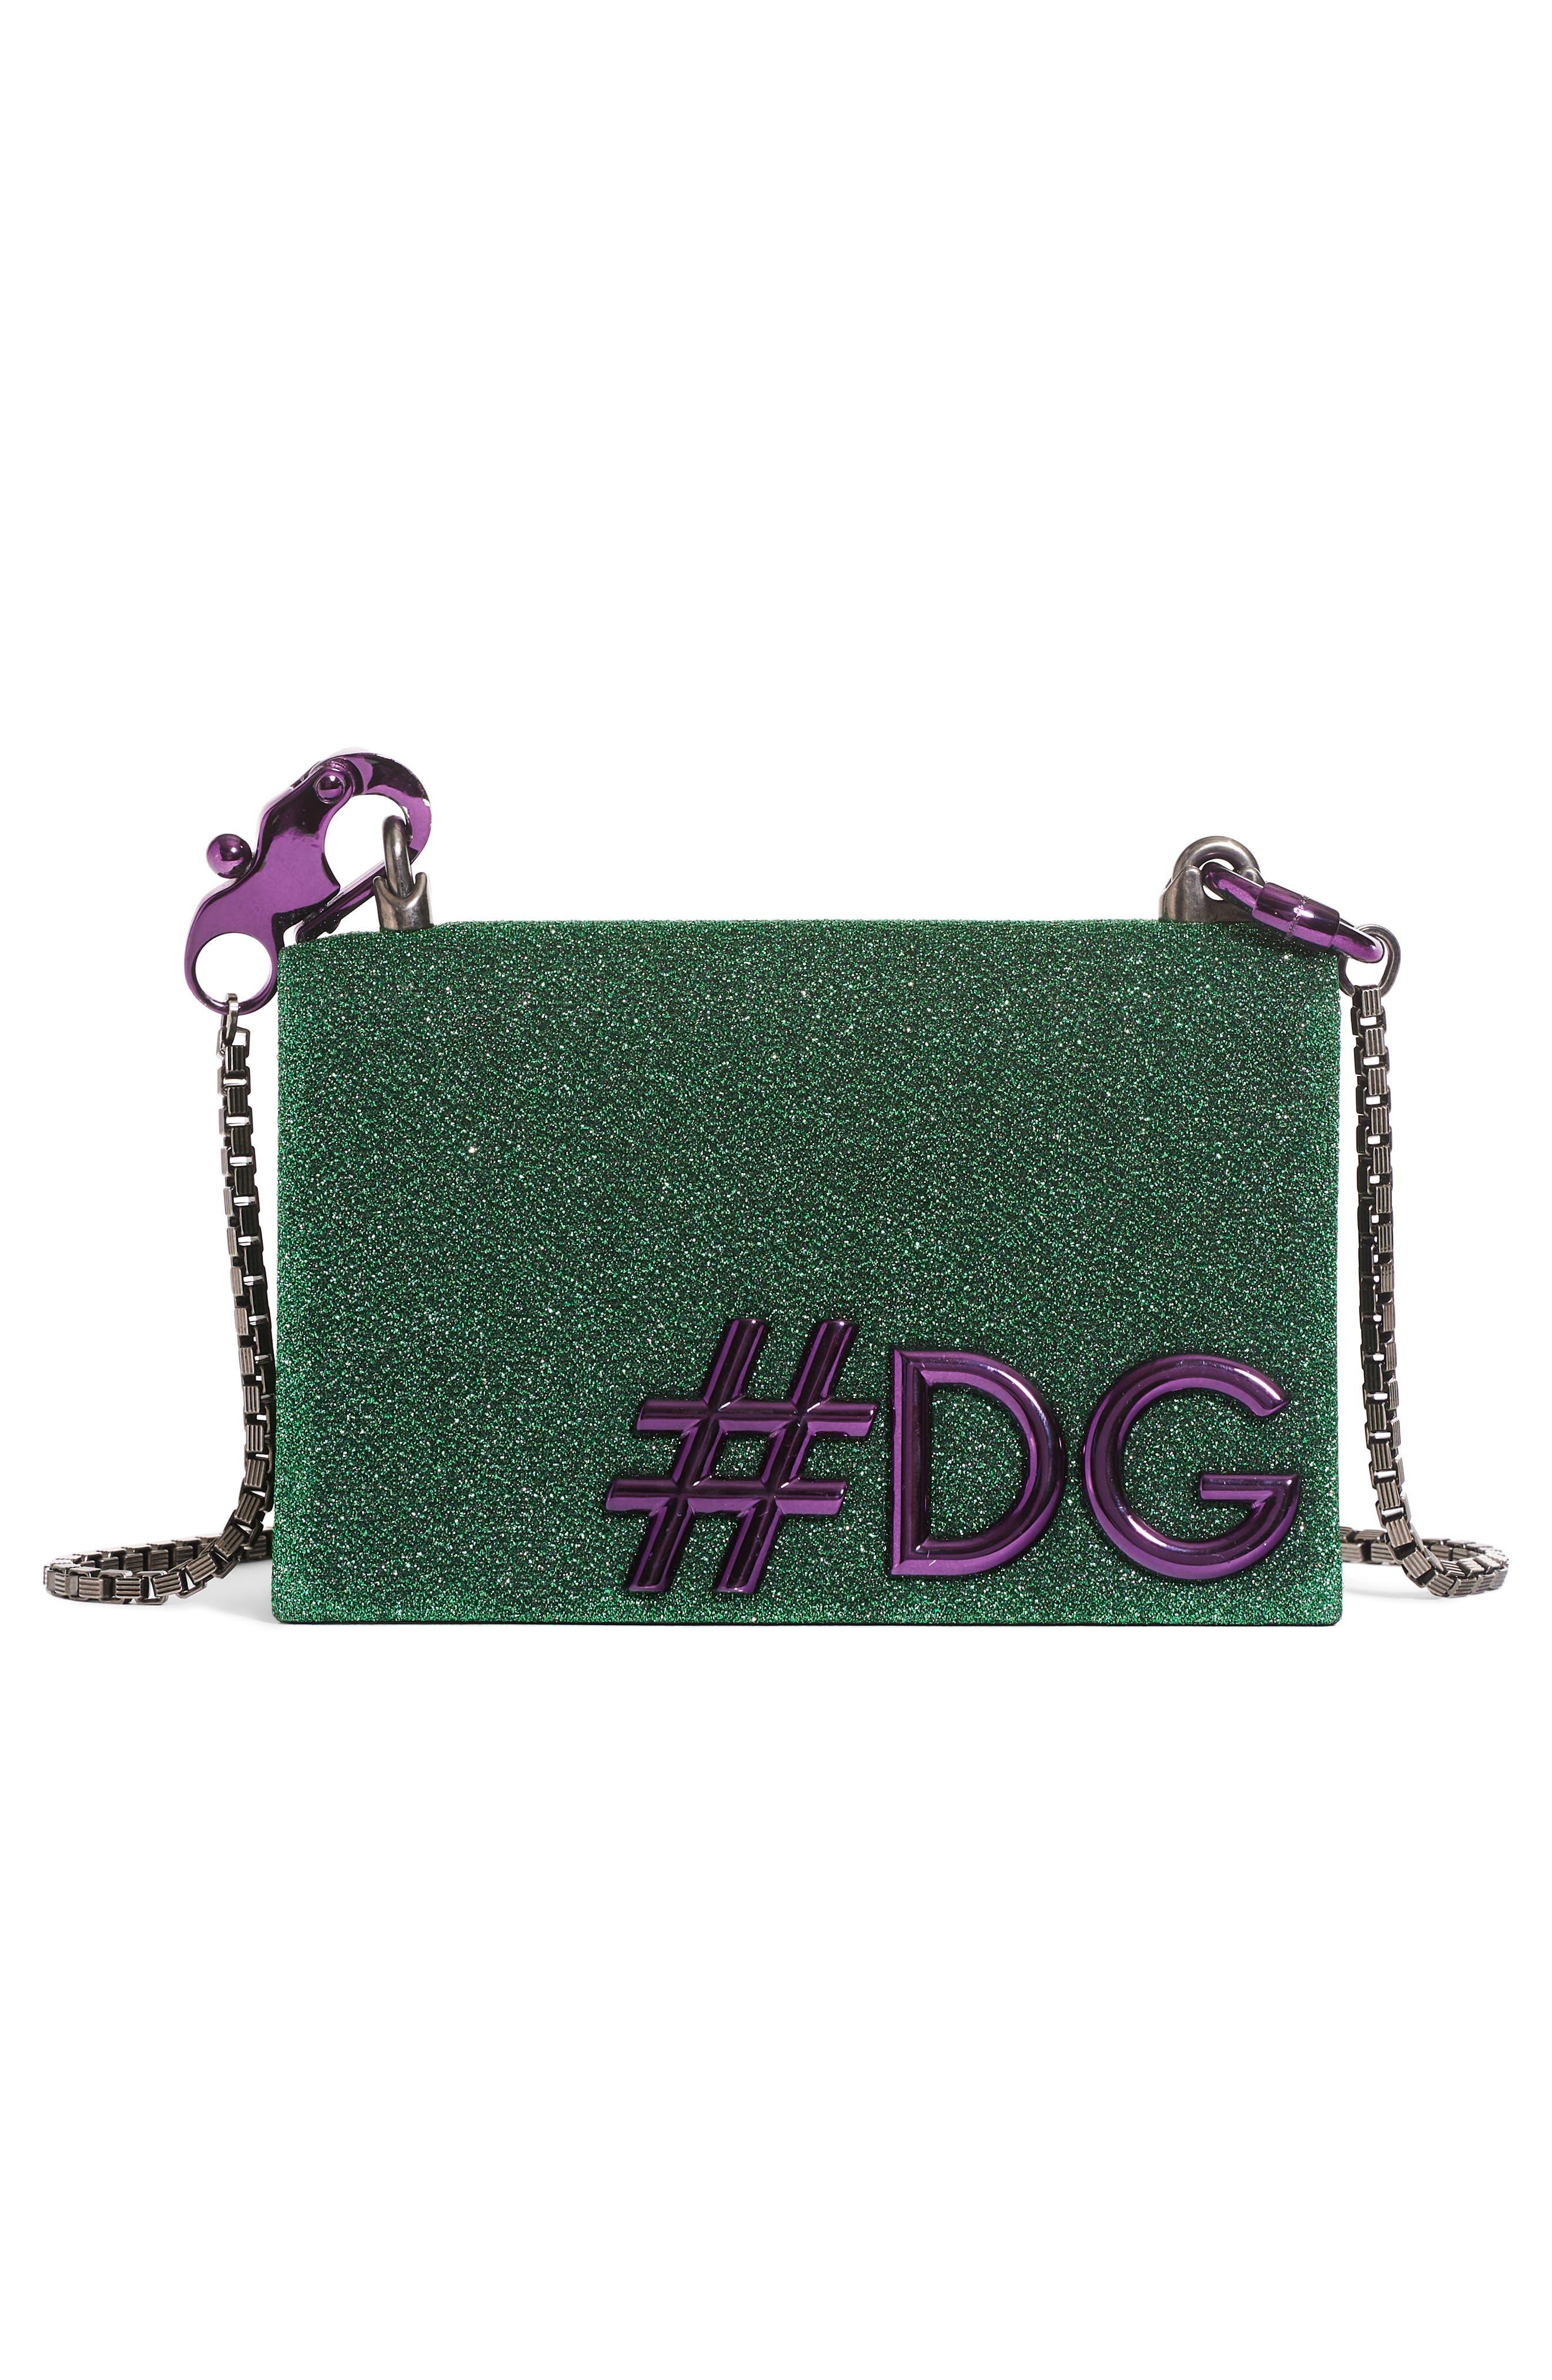 DG Girls Metallic Shoulder Bag,                             Alternate thumbnail 2, color,                             Green